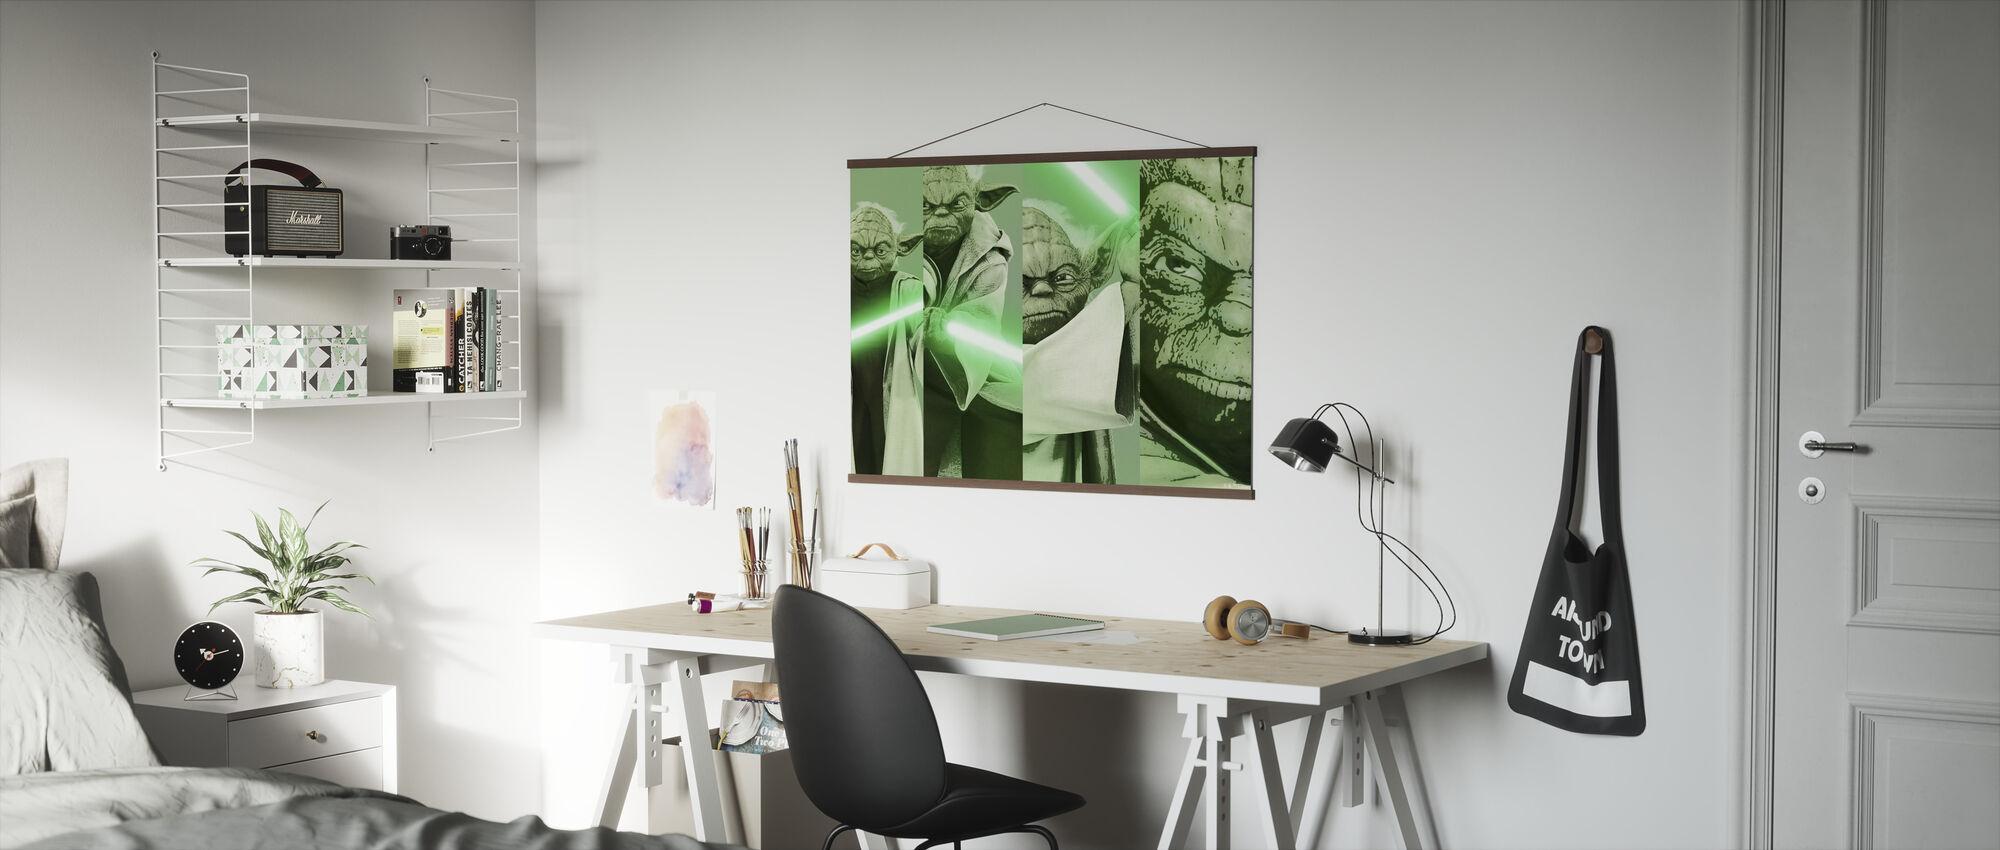 Stjärnornas krig - Yoda x 4 - Poster - Kontor